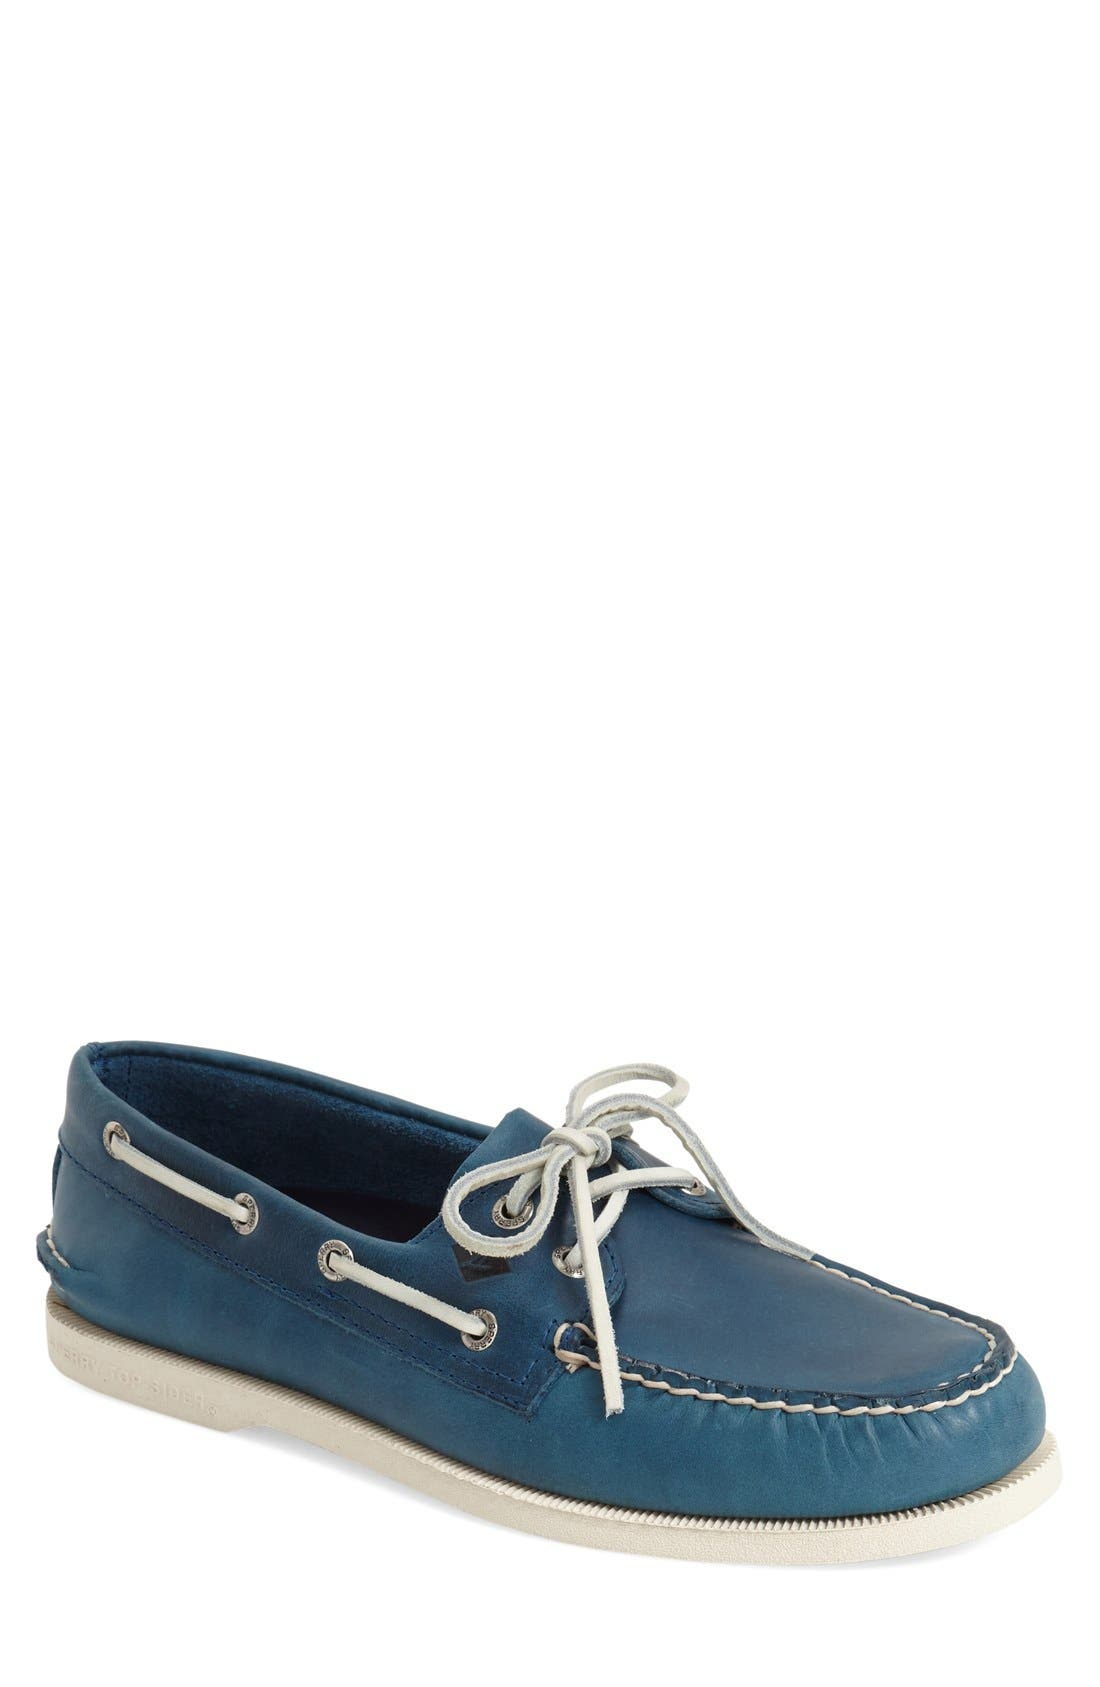 Alternate Image 1 Selected - Sperry 'Authentic Original' Boat Shoe (Men)